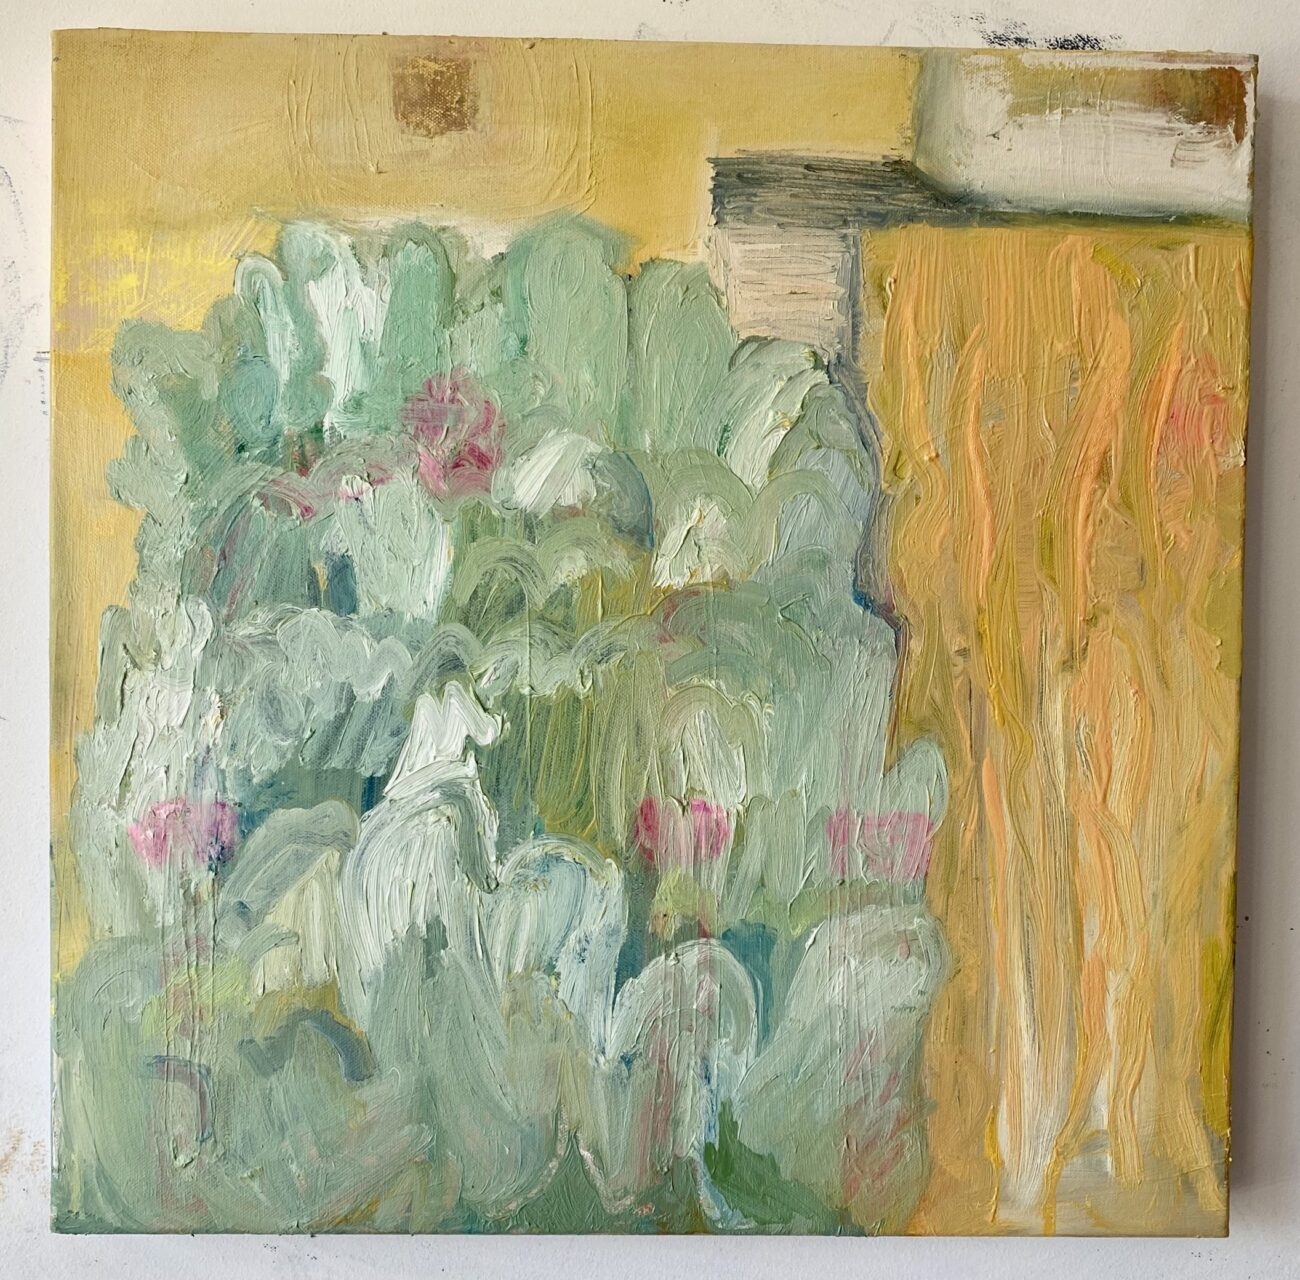 Midsummer on Medlock acrylic and oil on canvas 50x50cm